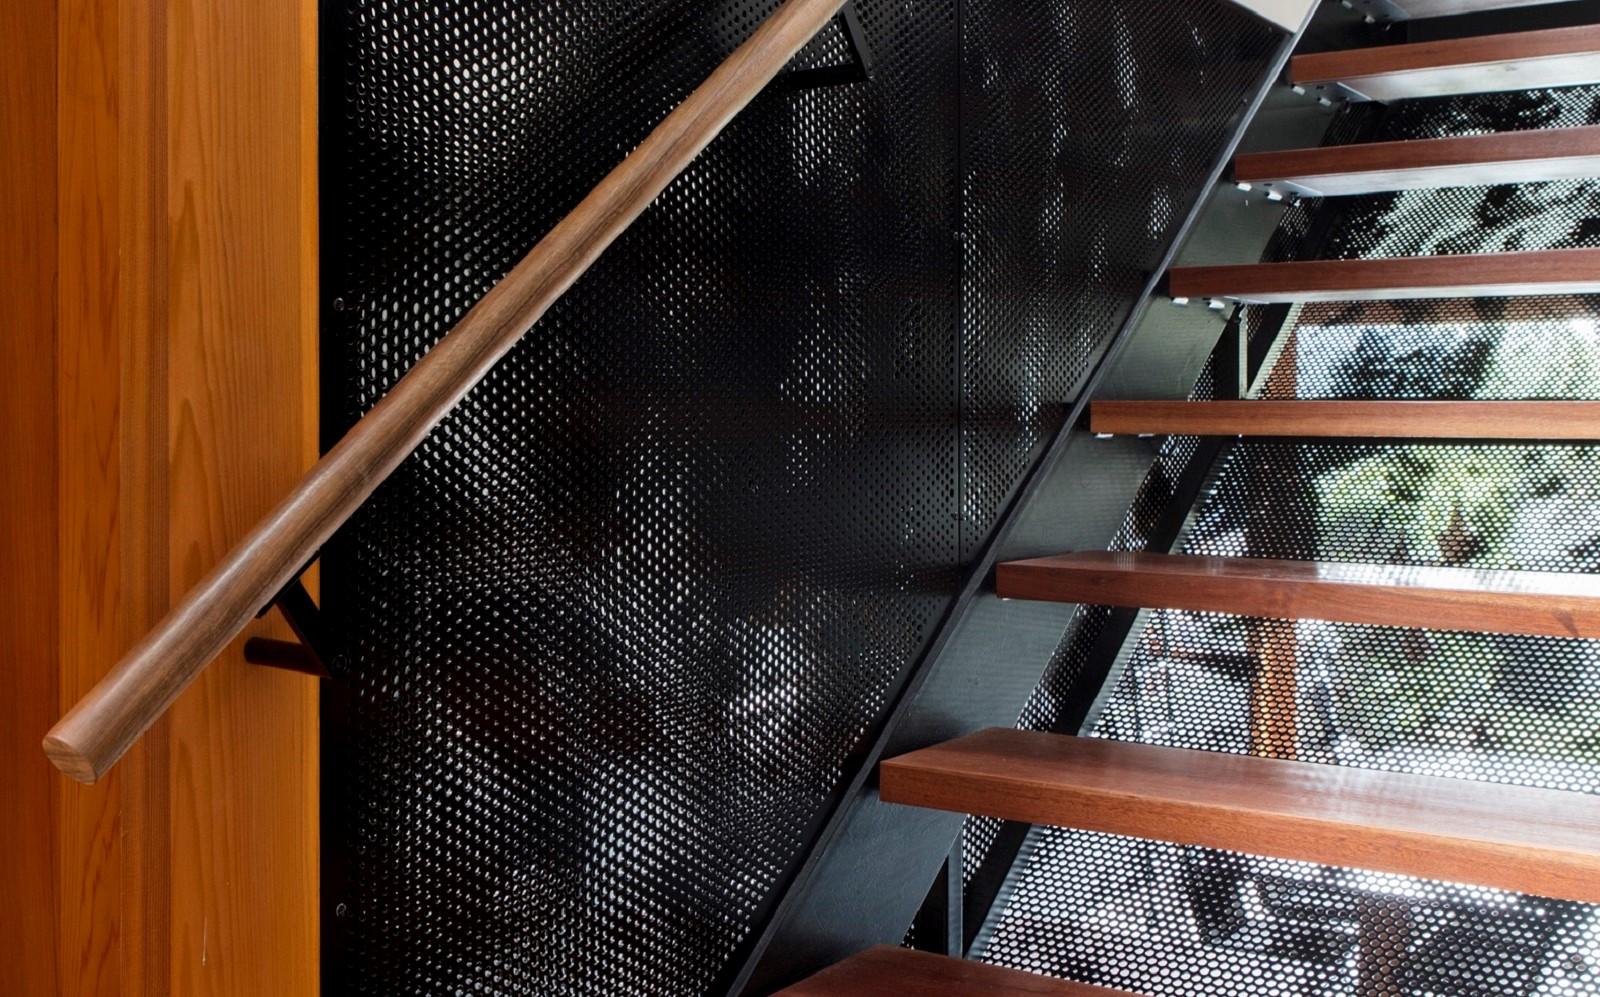 Balustrade design tips - metal balustrade with bespoke design